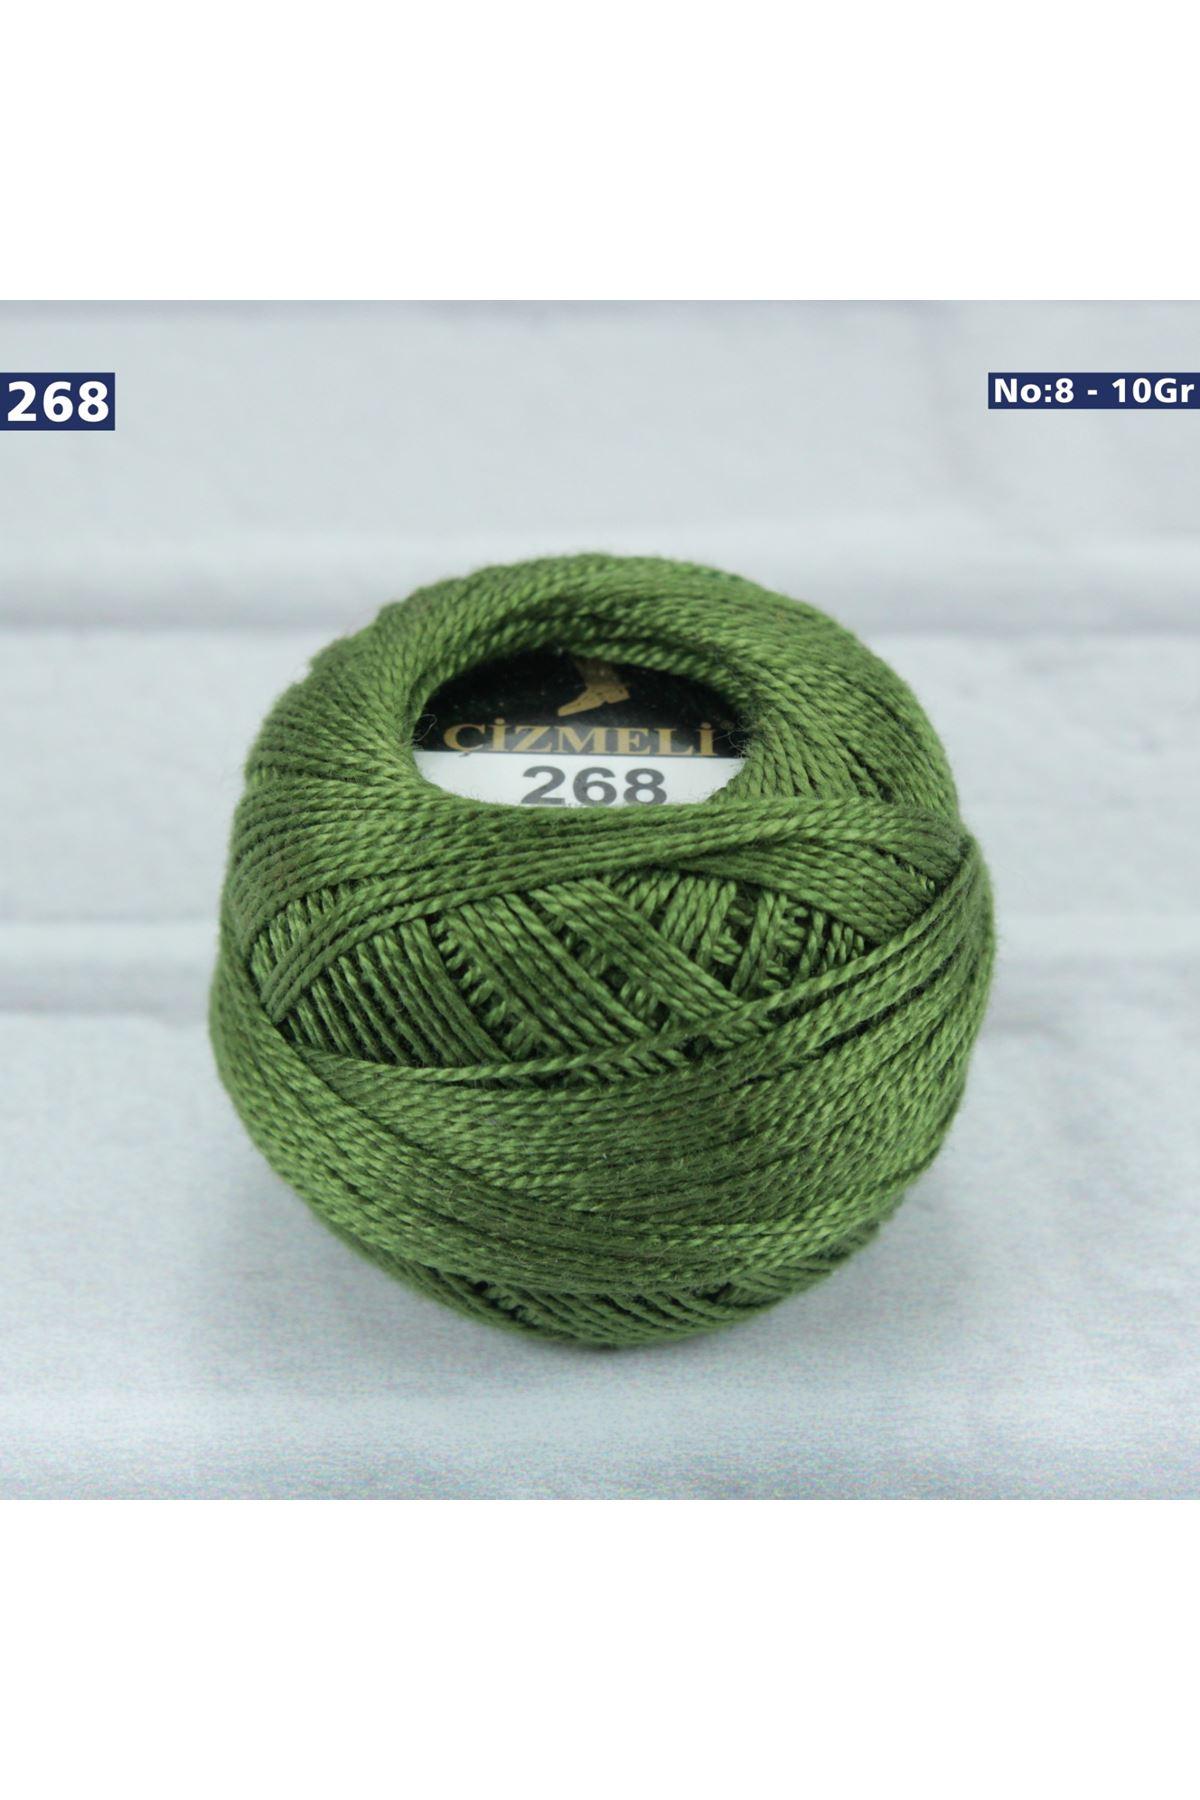 Çizmeli Cotton Perle Nakış İpliği No: 268